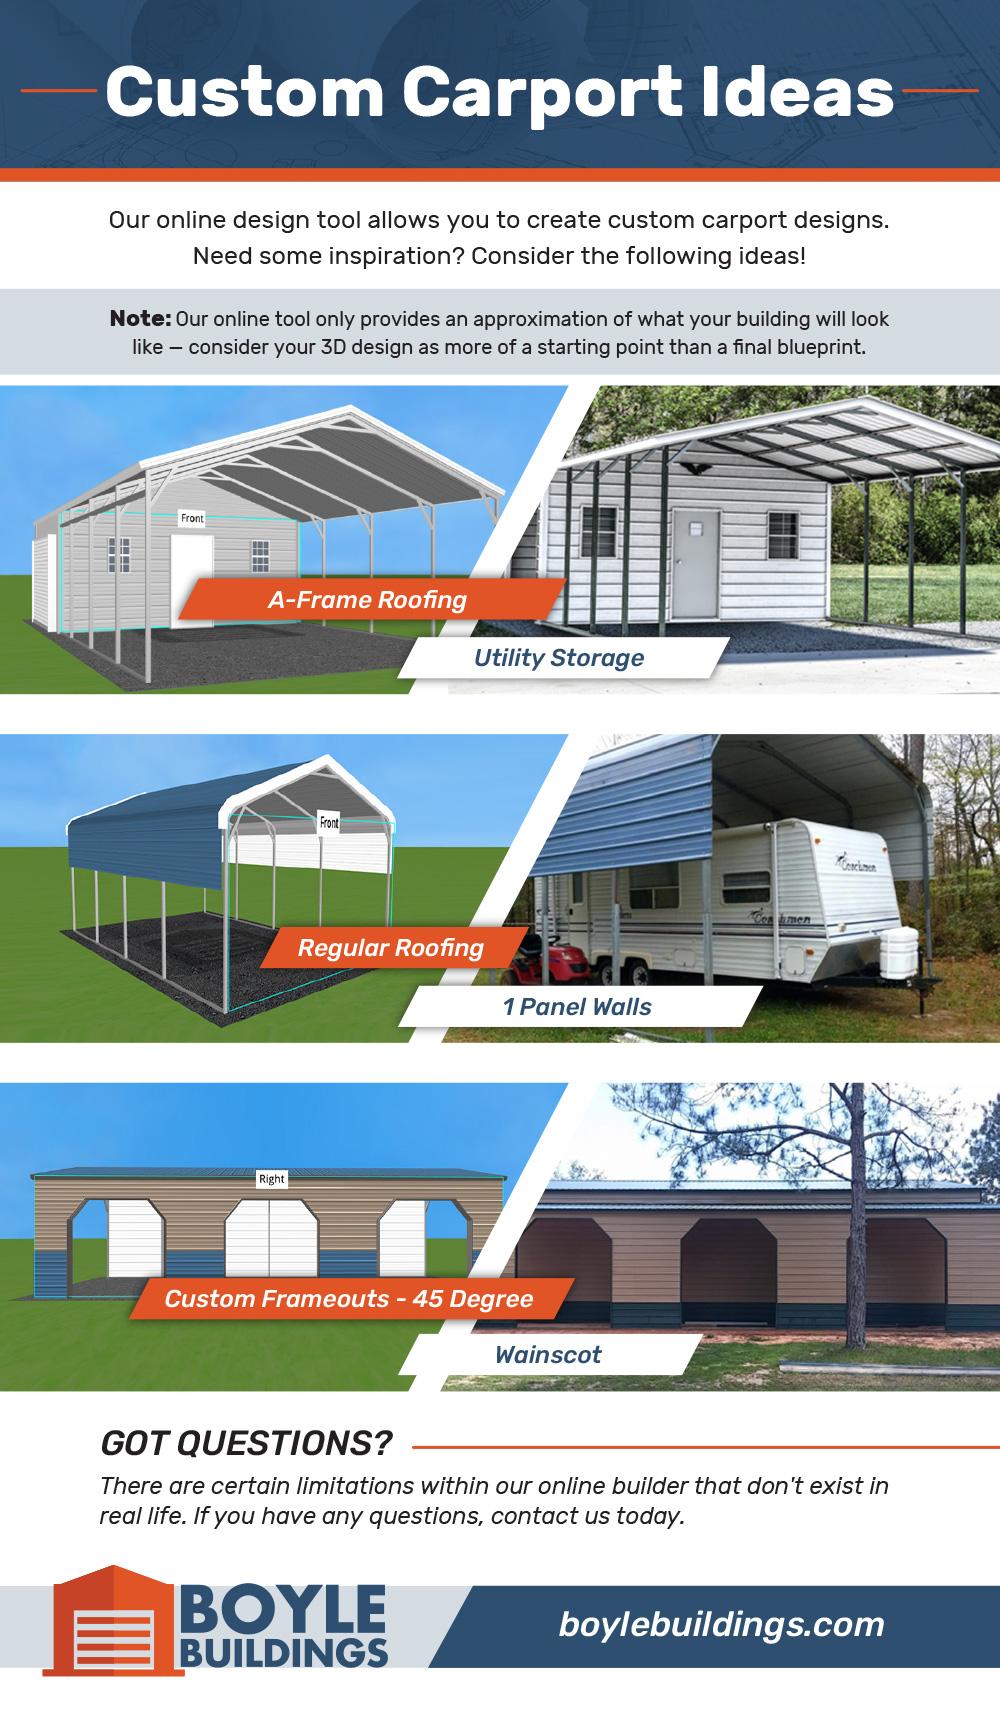 Carport Ideas Infographic